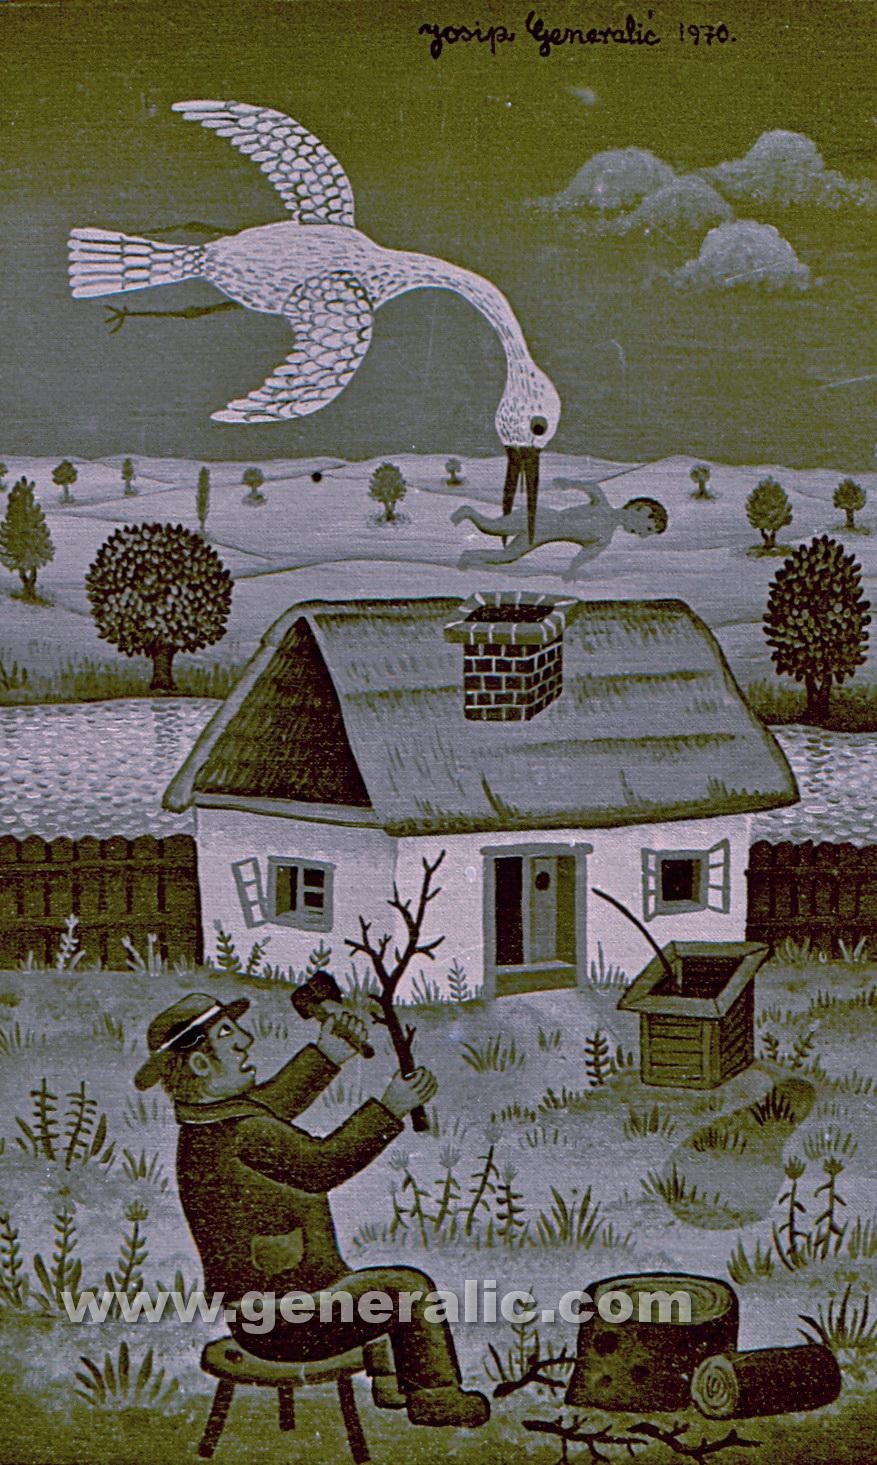 Josip Generalic, 1970, White stork, oil on canvas